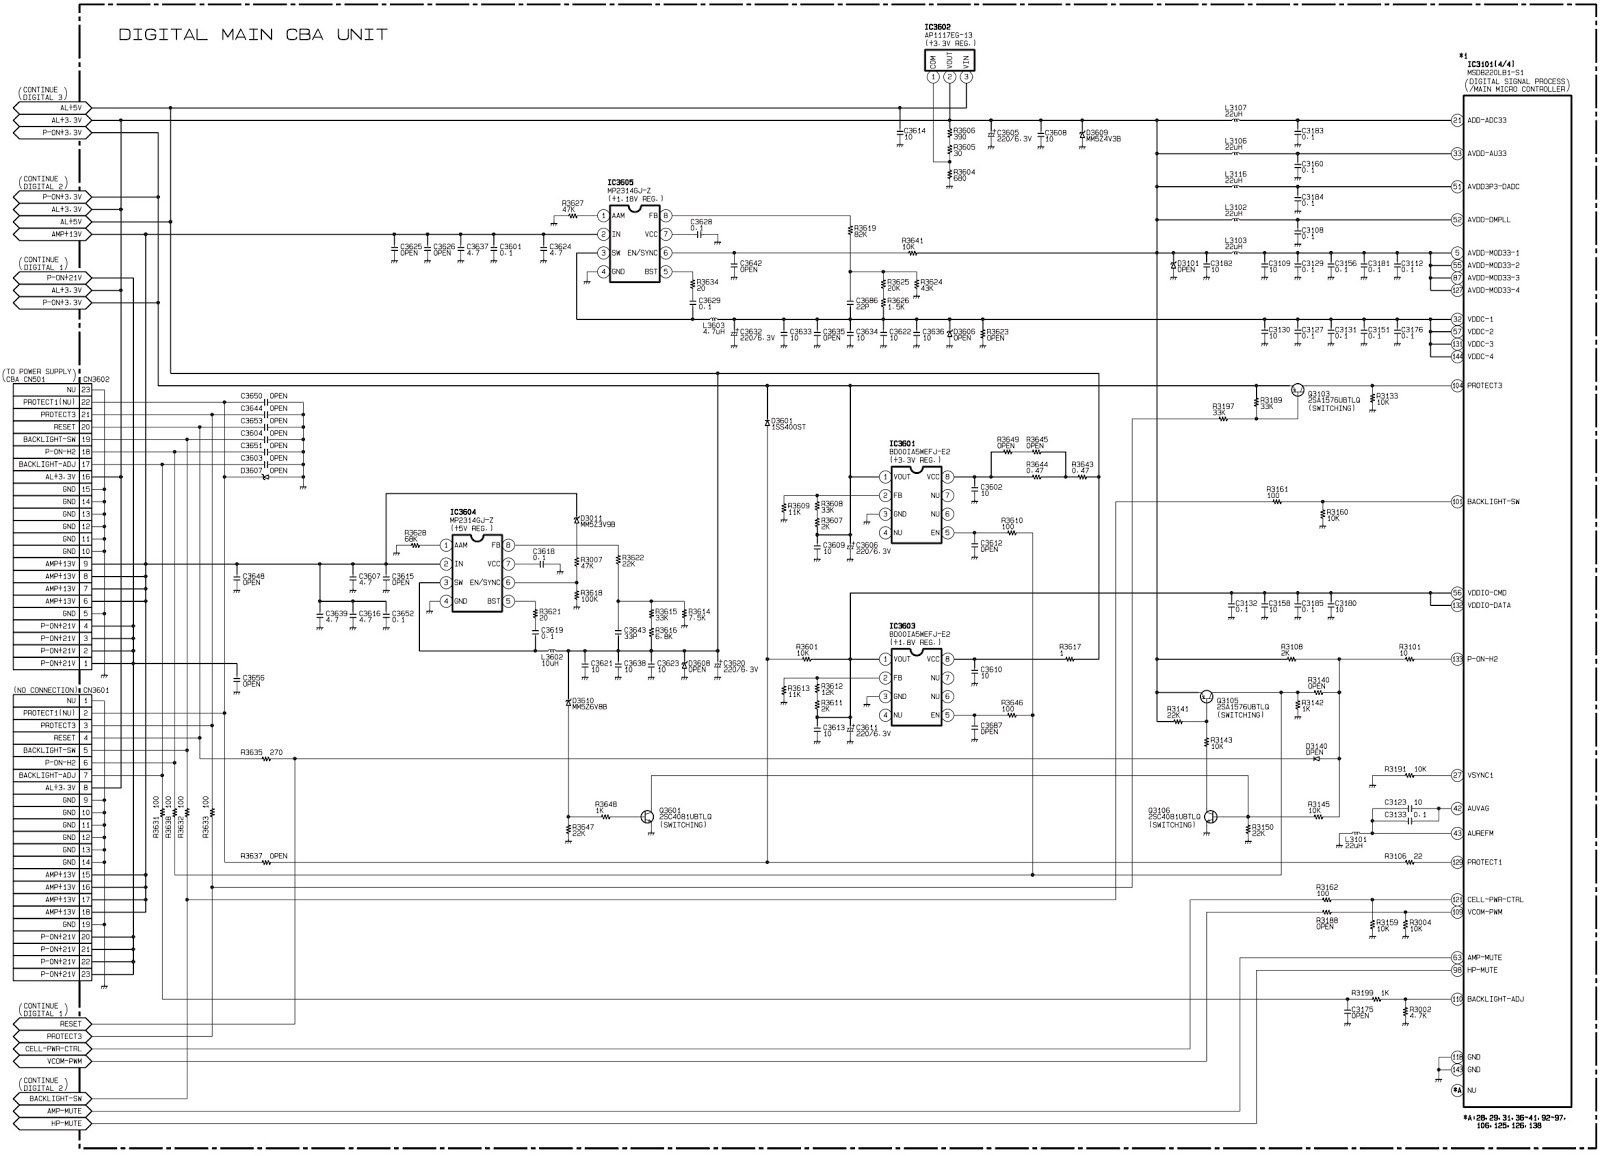 Manguonblog Thng Hai 2016 Electronic Circuit Diagram Tv Vertical Using La78041 La78040 Control Panel For Both Type